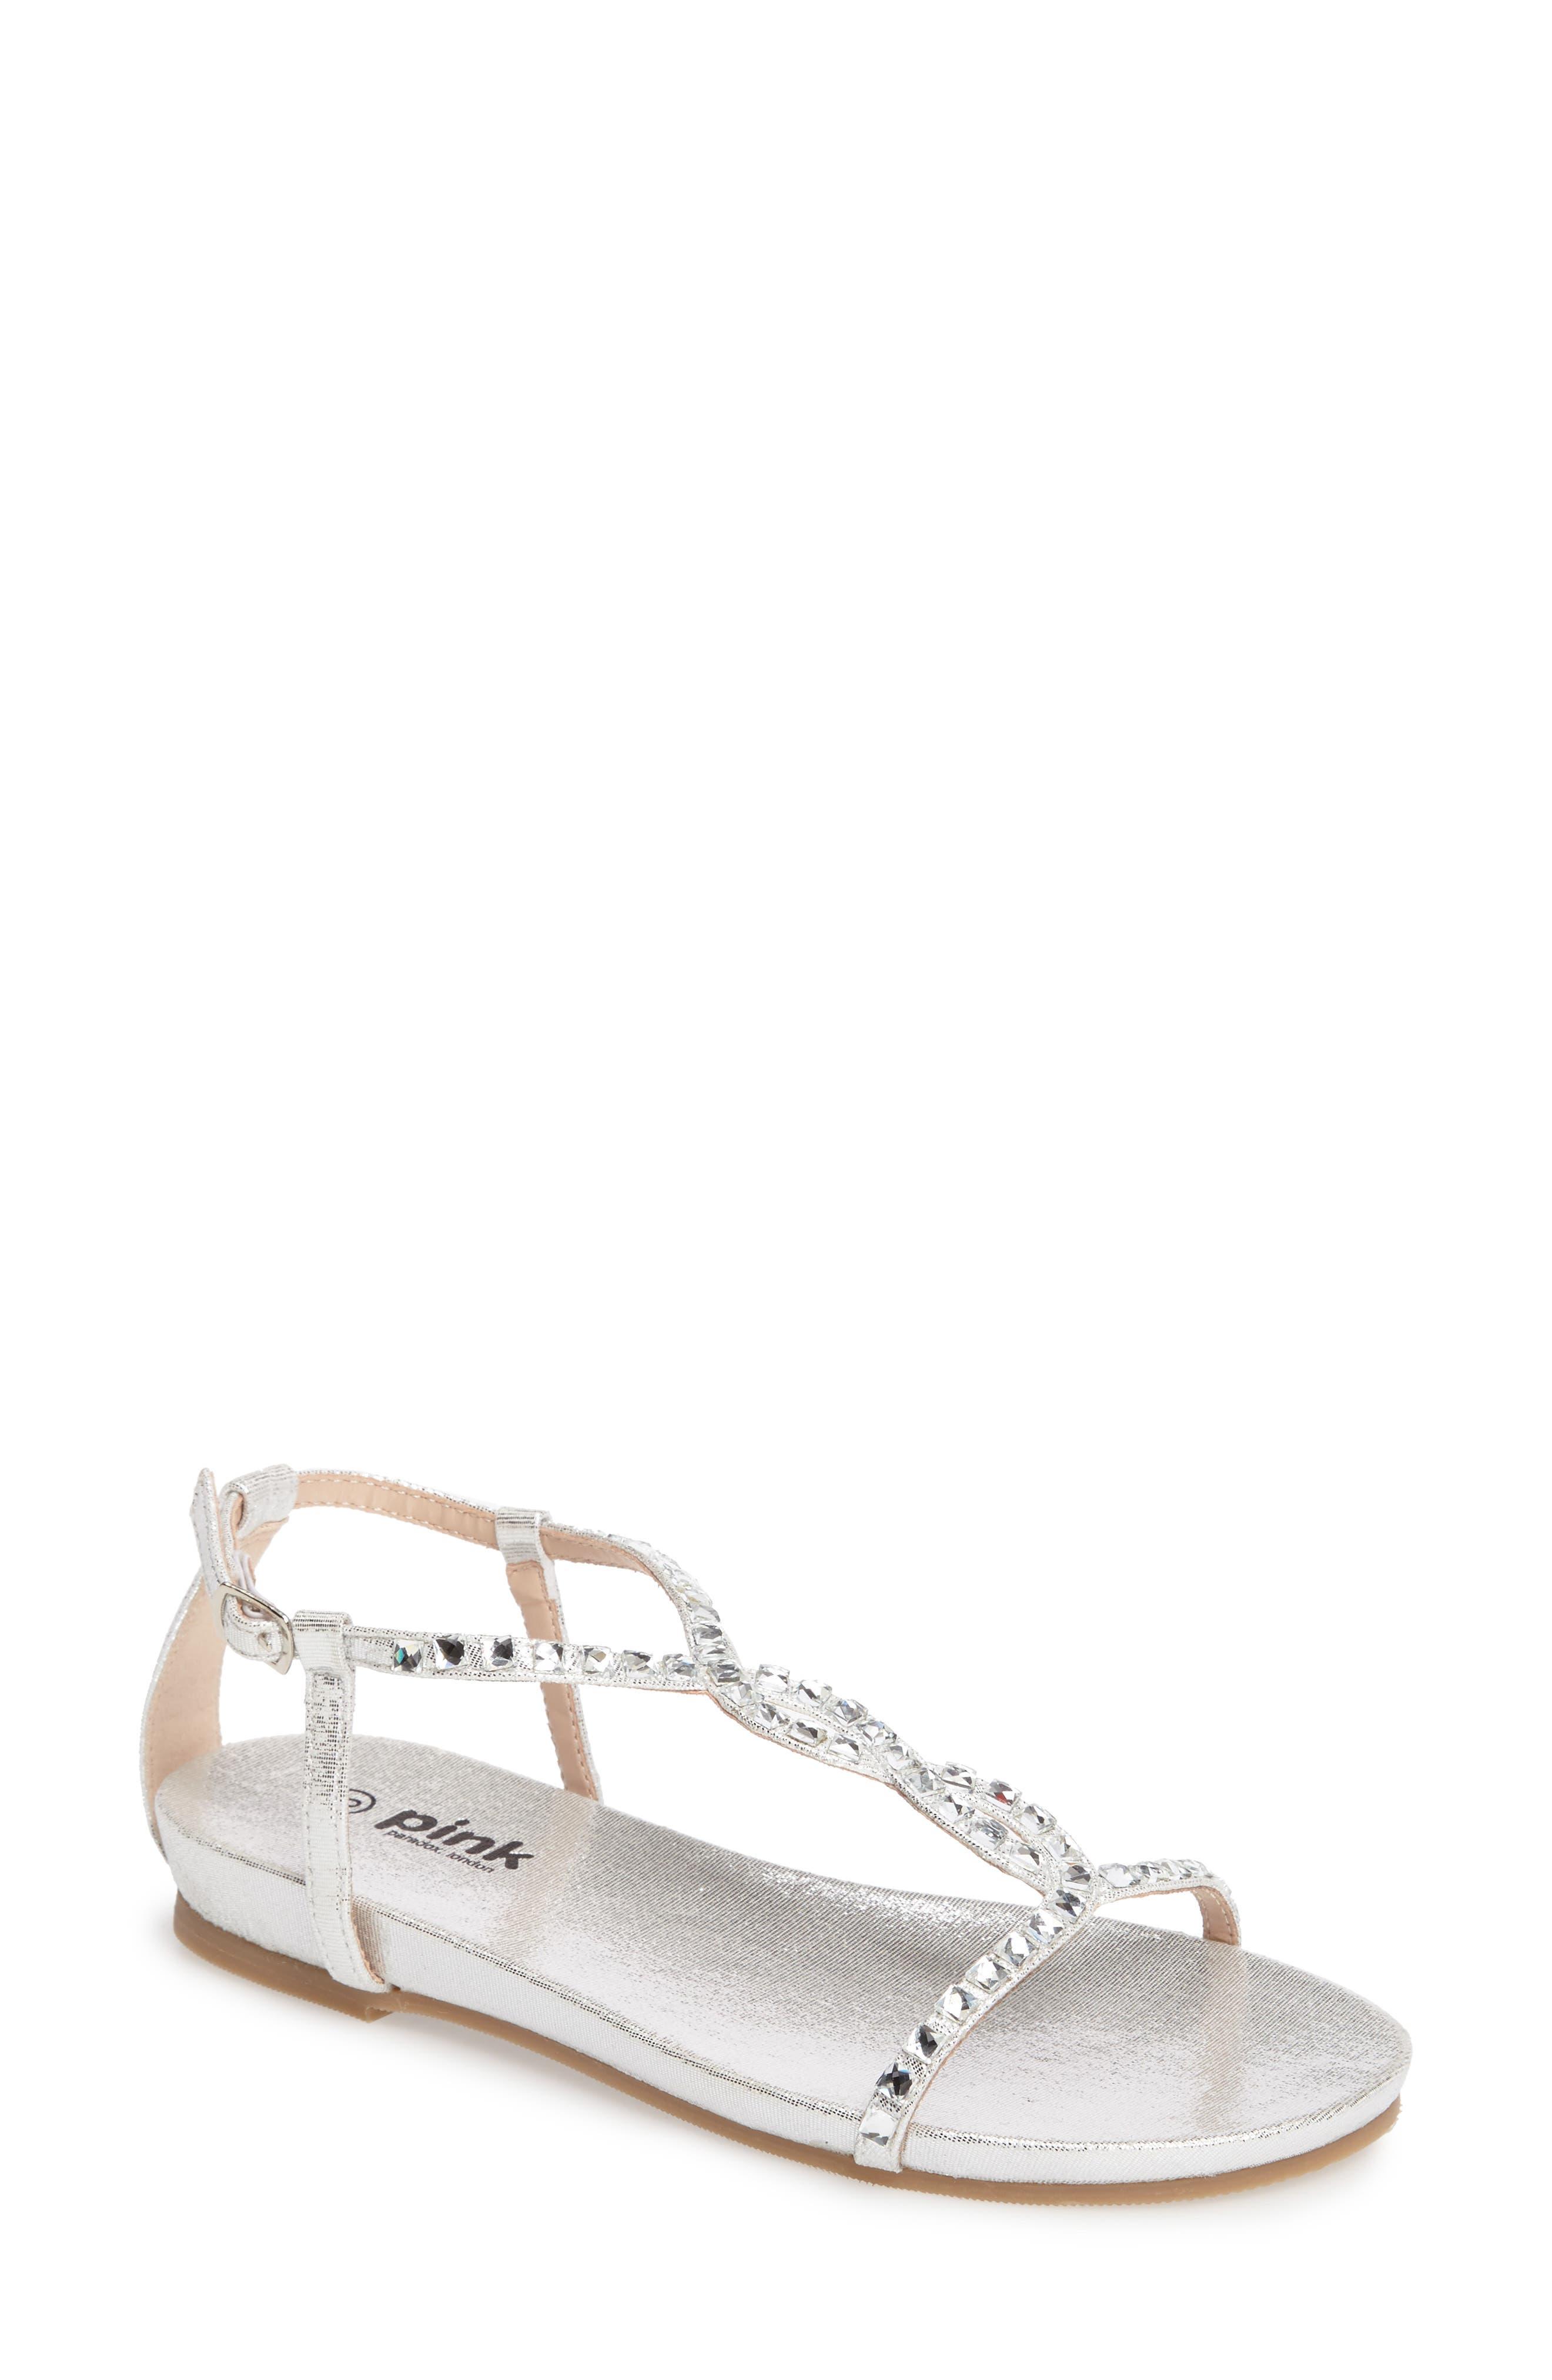 Paradox London Pink Kaylee Ankle Strap Sandal